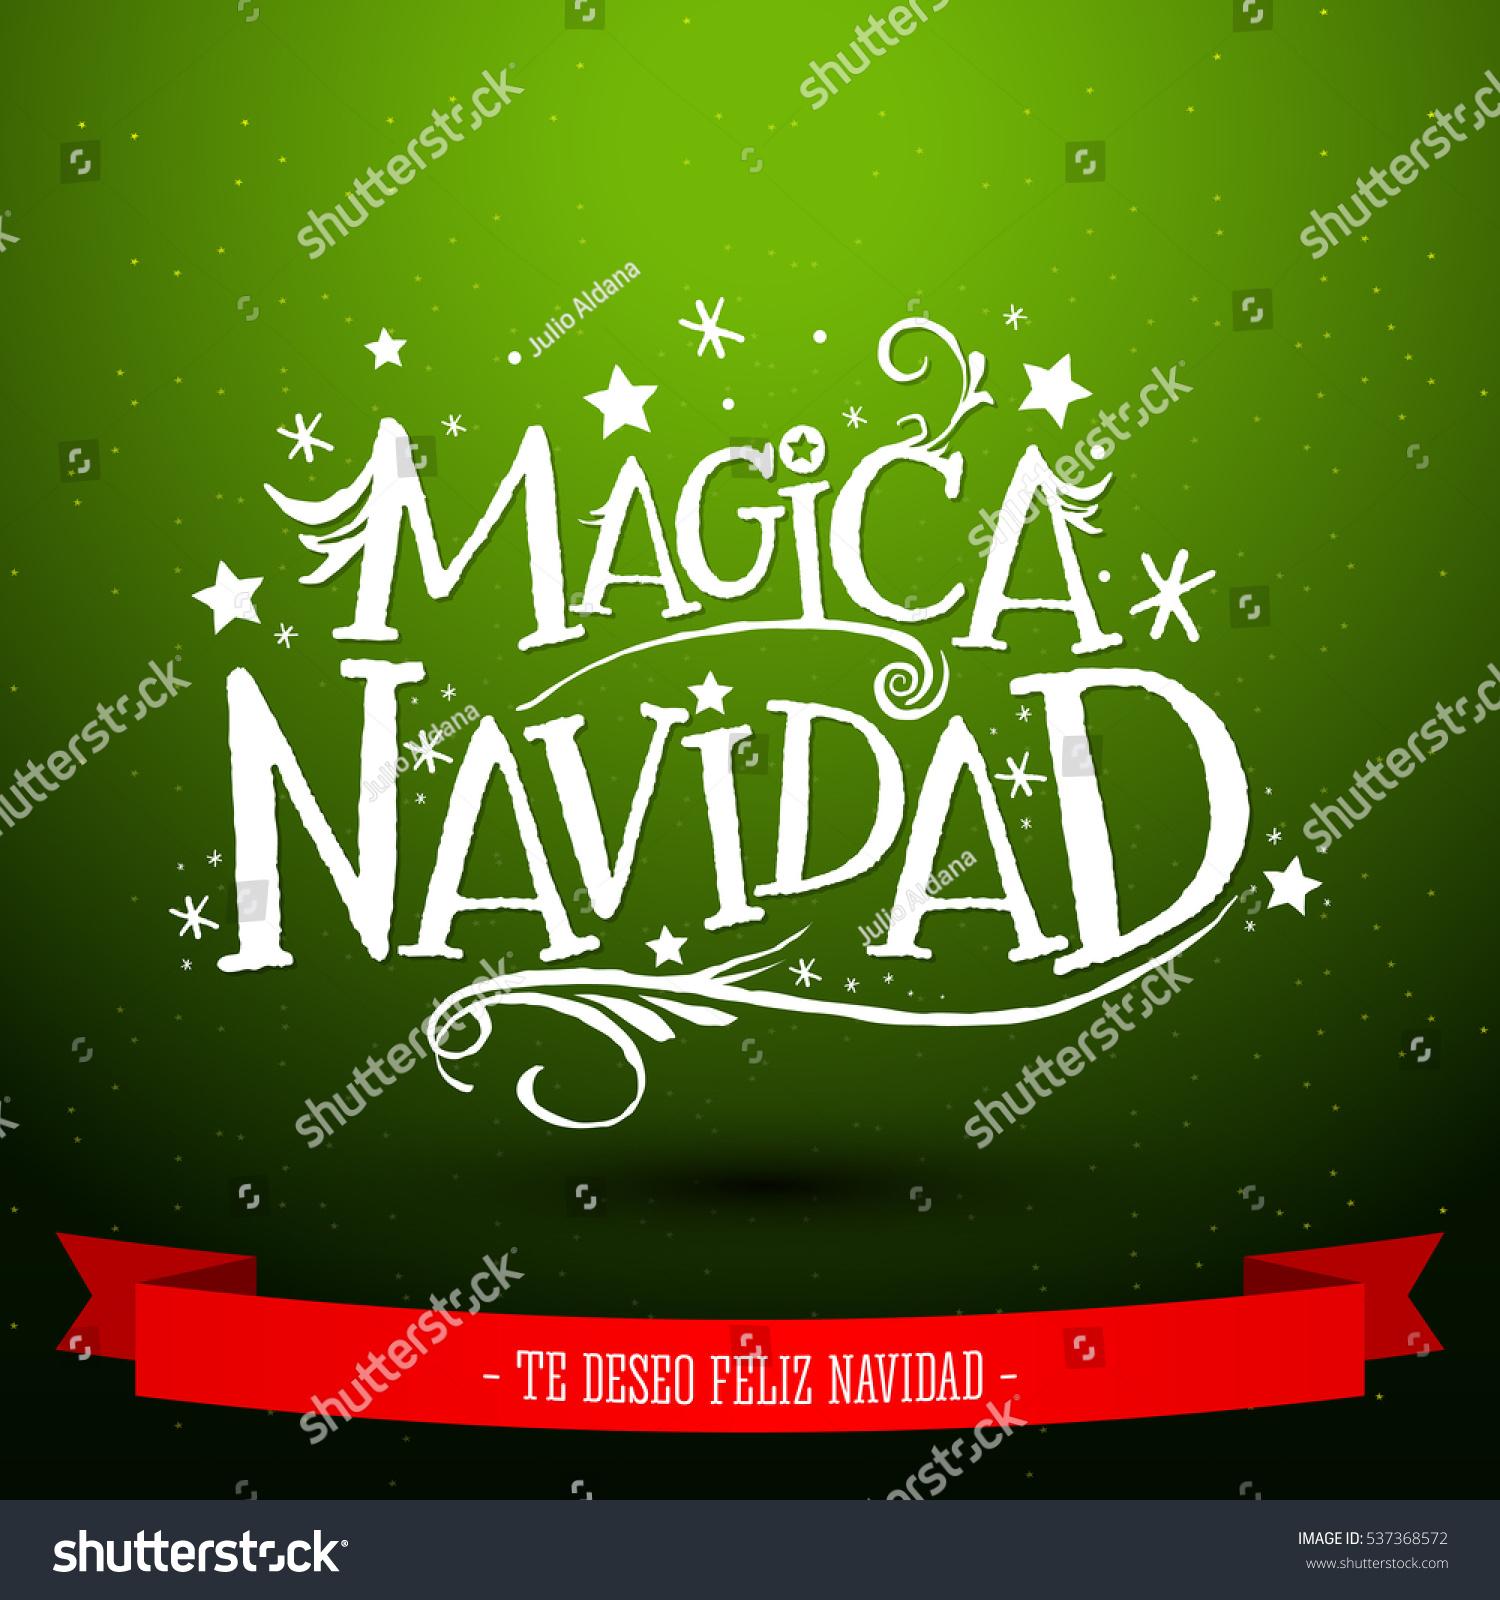 magica navidad spanish translation magic christmas holiday greeting card merry christmas lettering